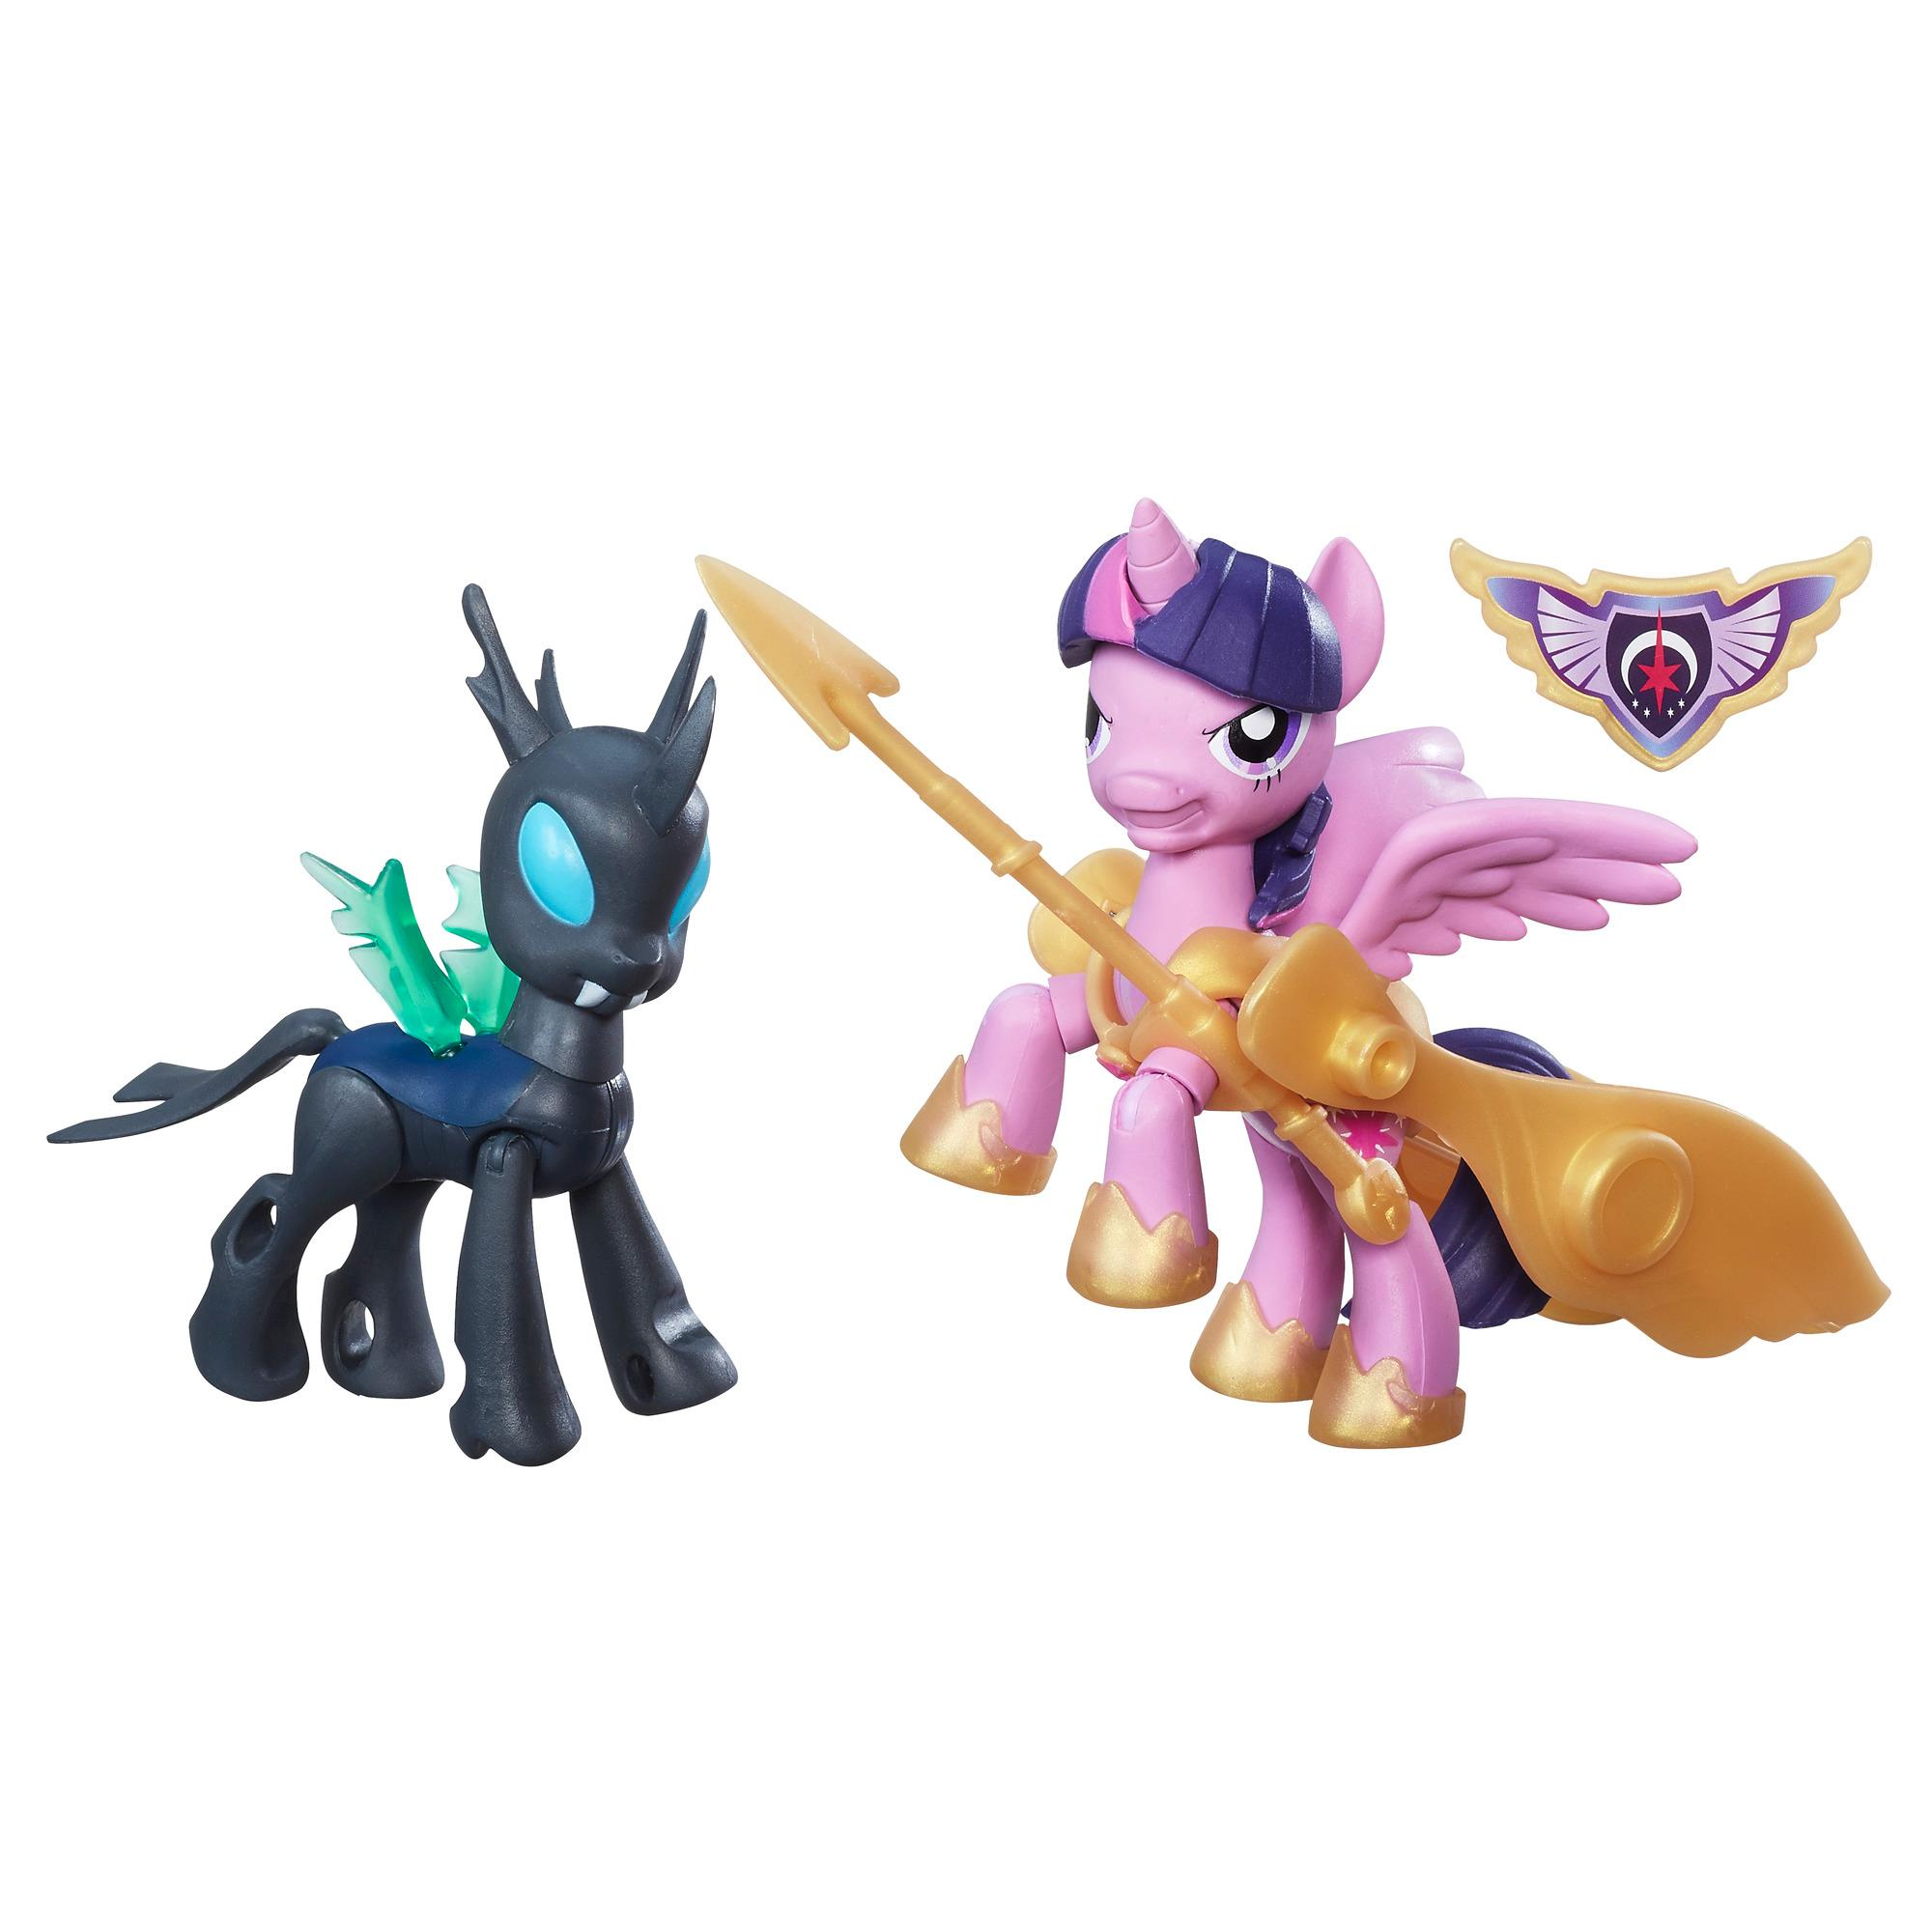 My Little Pony Guardians of Harmony Princess Twilight Sparkle vs. Changeling